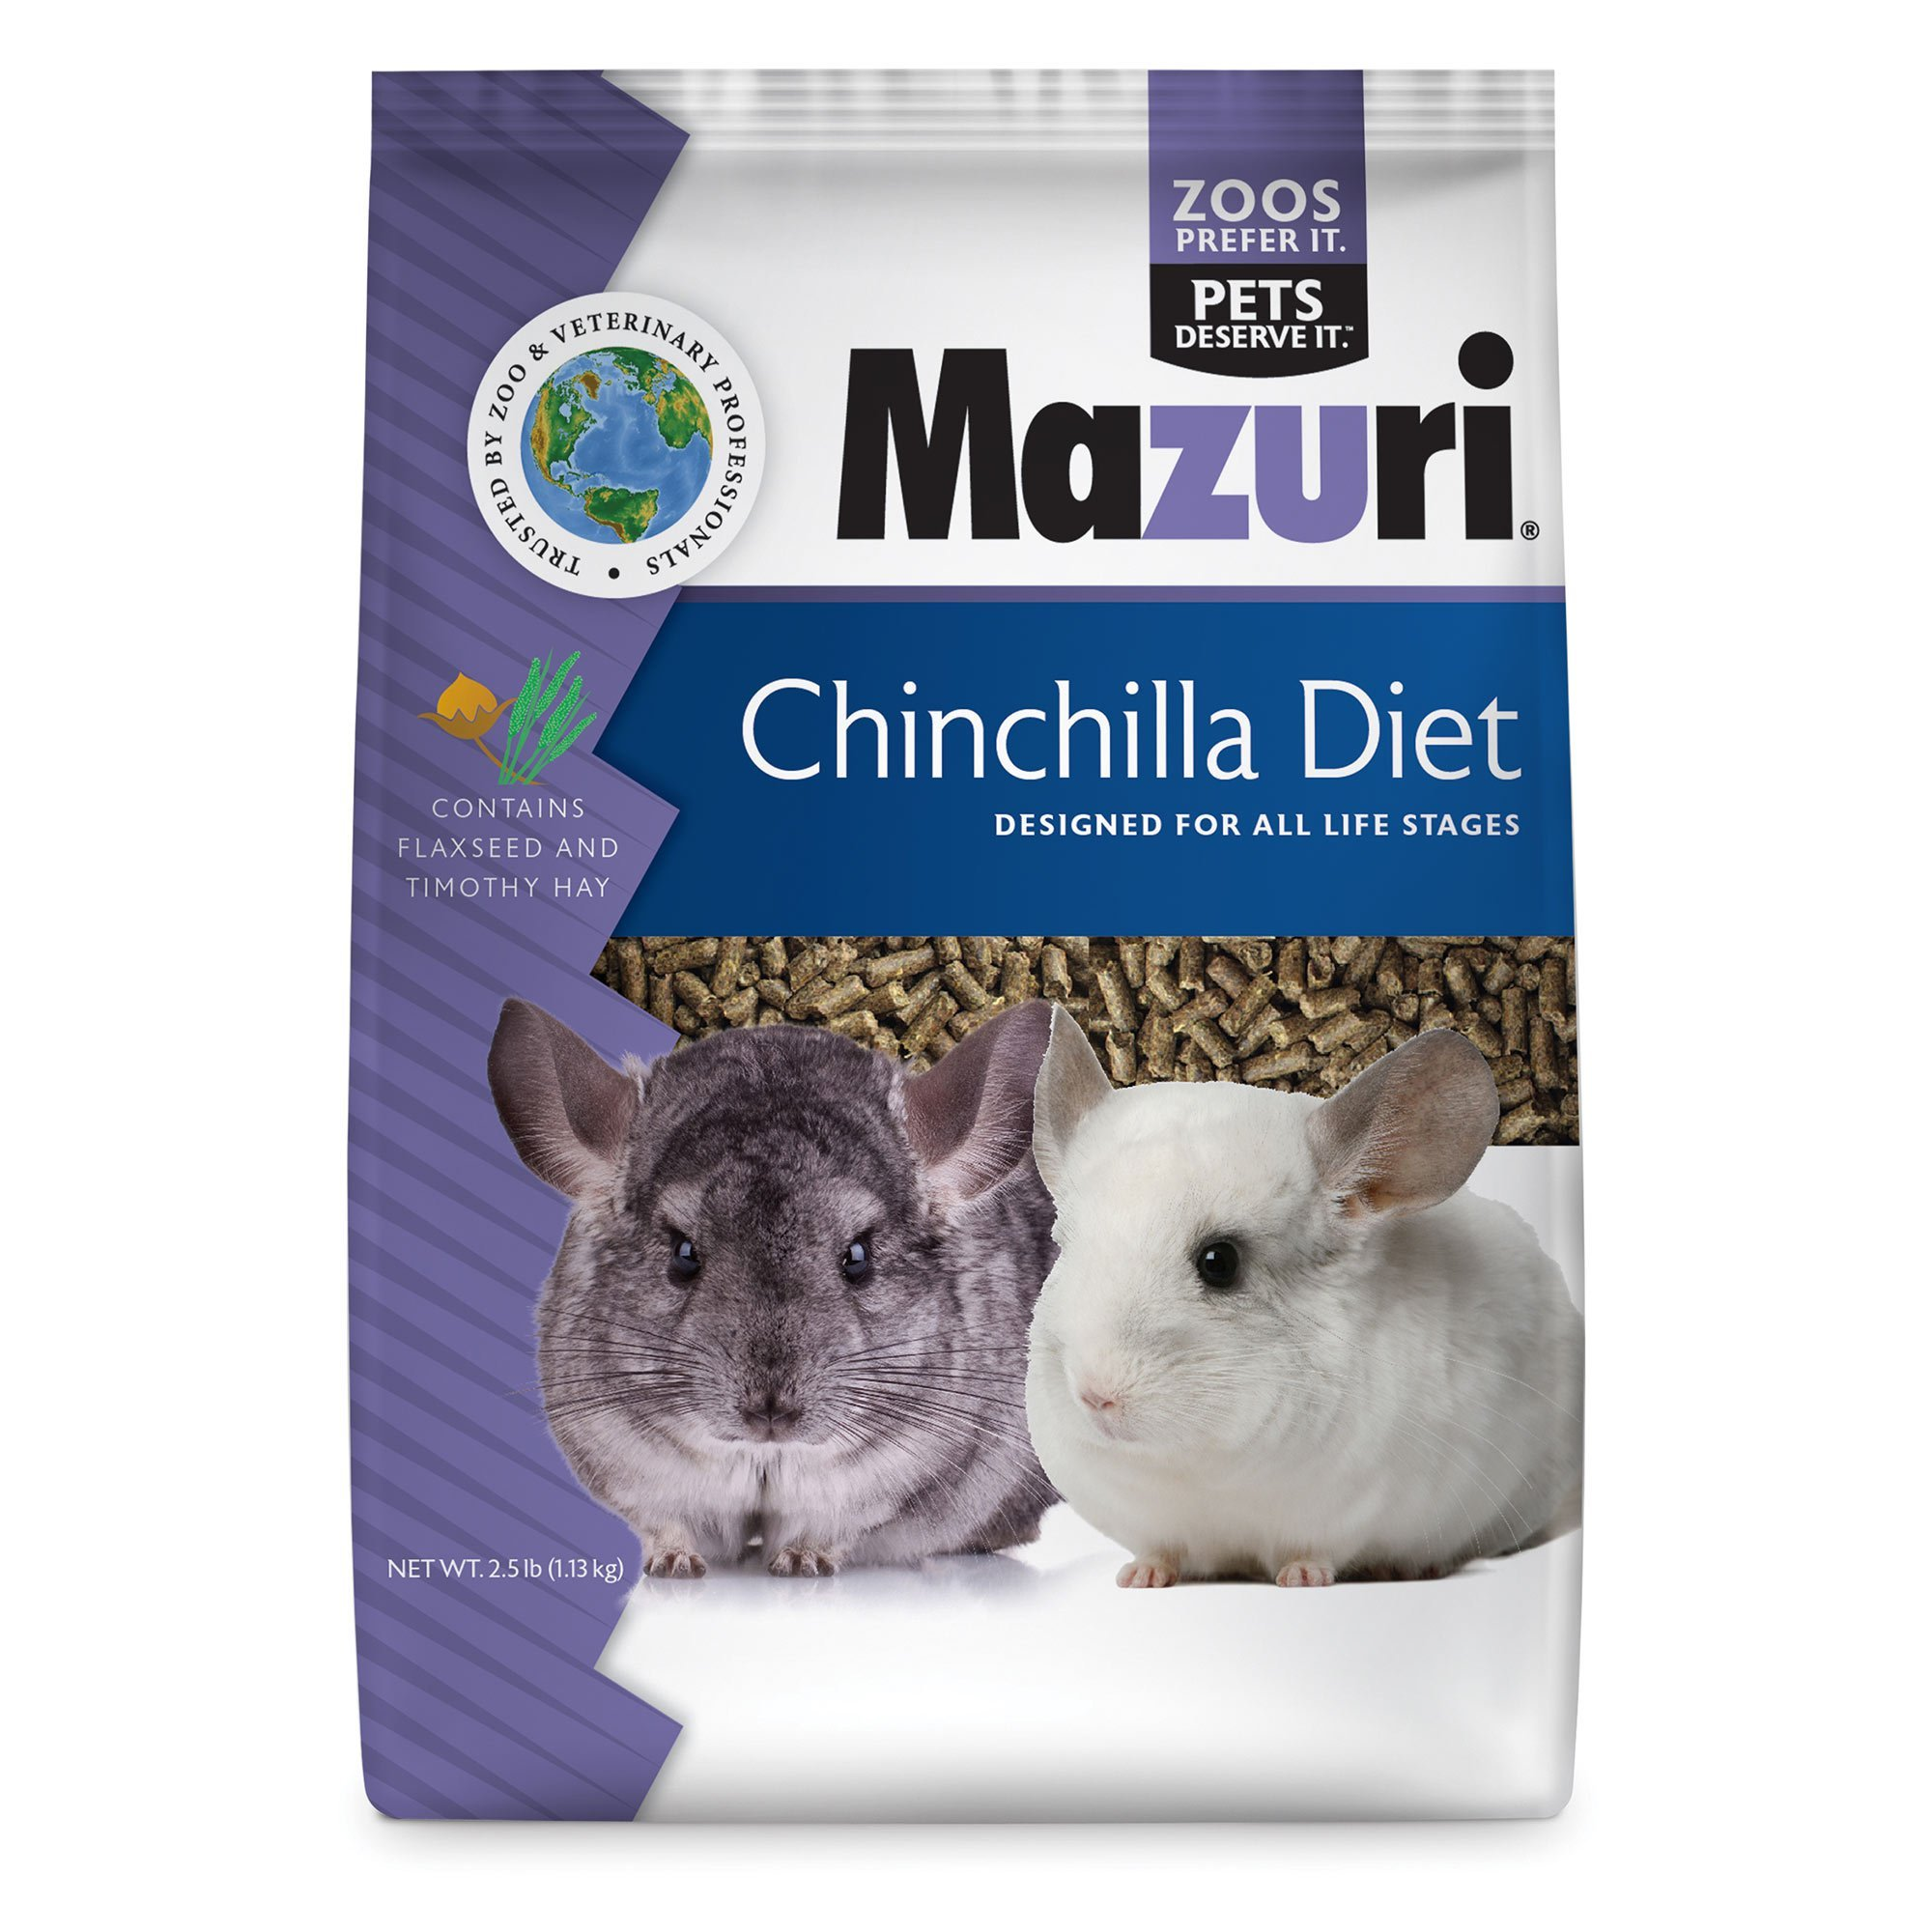 Mazuri Chinchilla Diet, 2.5 lb Bag